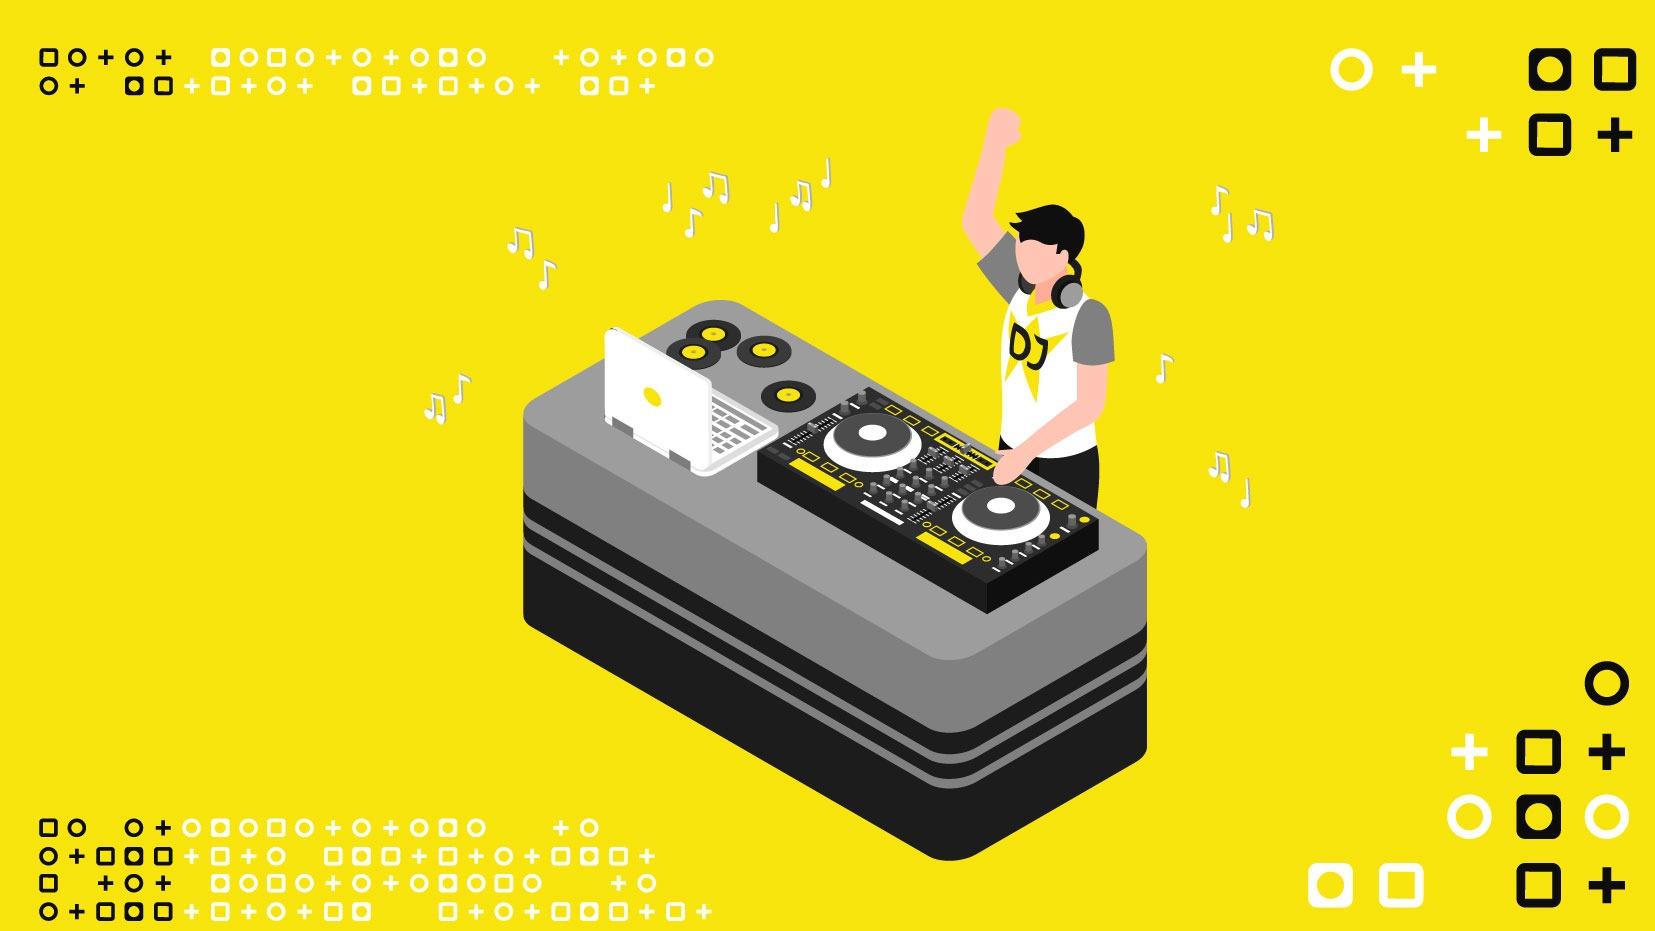 Tunes from the pandemic, meet ArganoUV's DJ of the Apocalypse